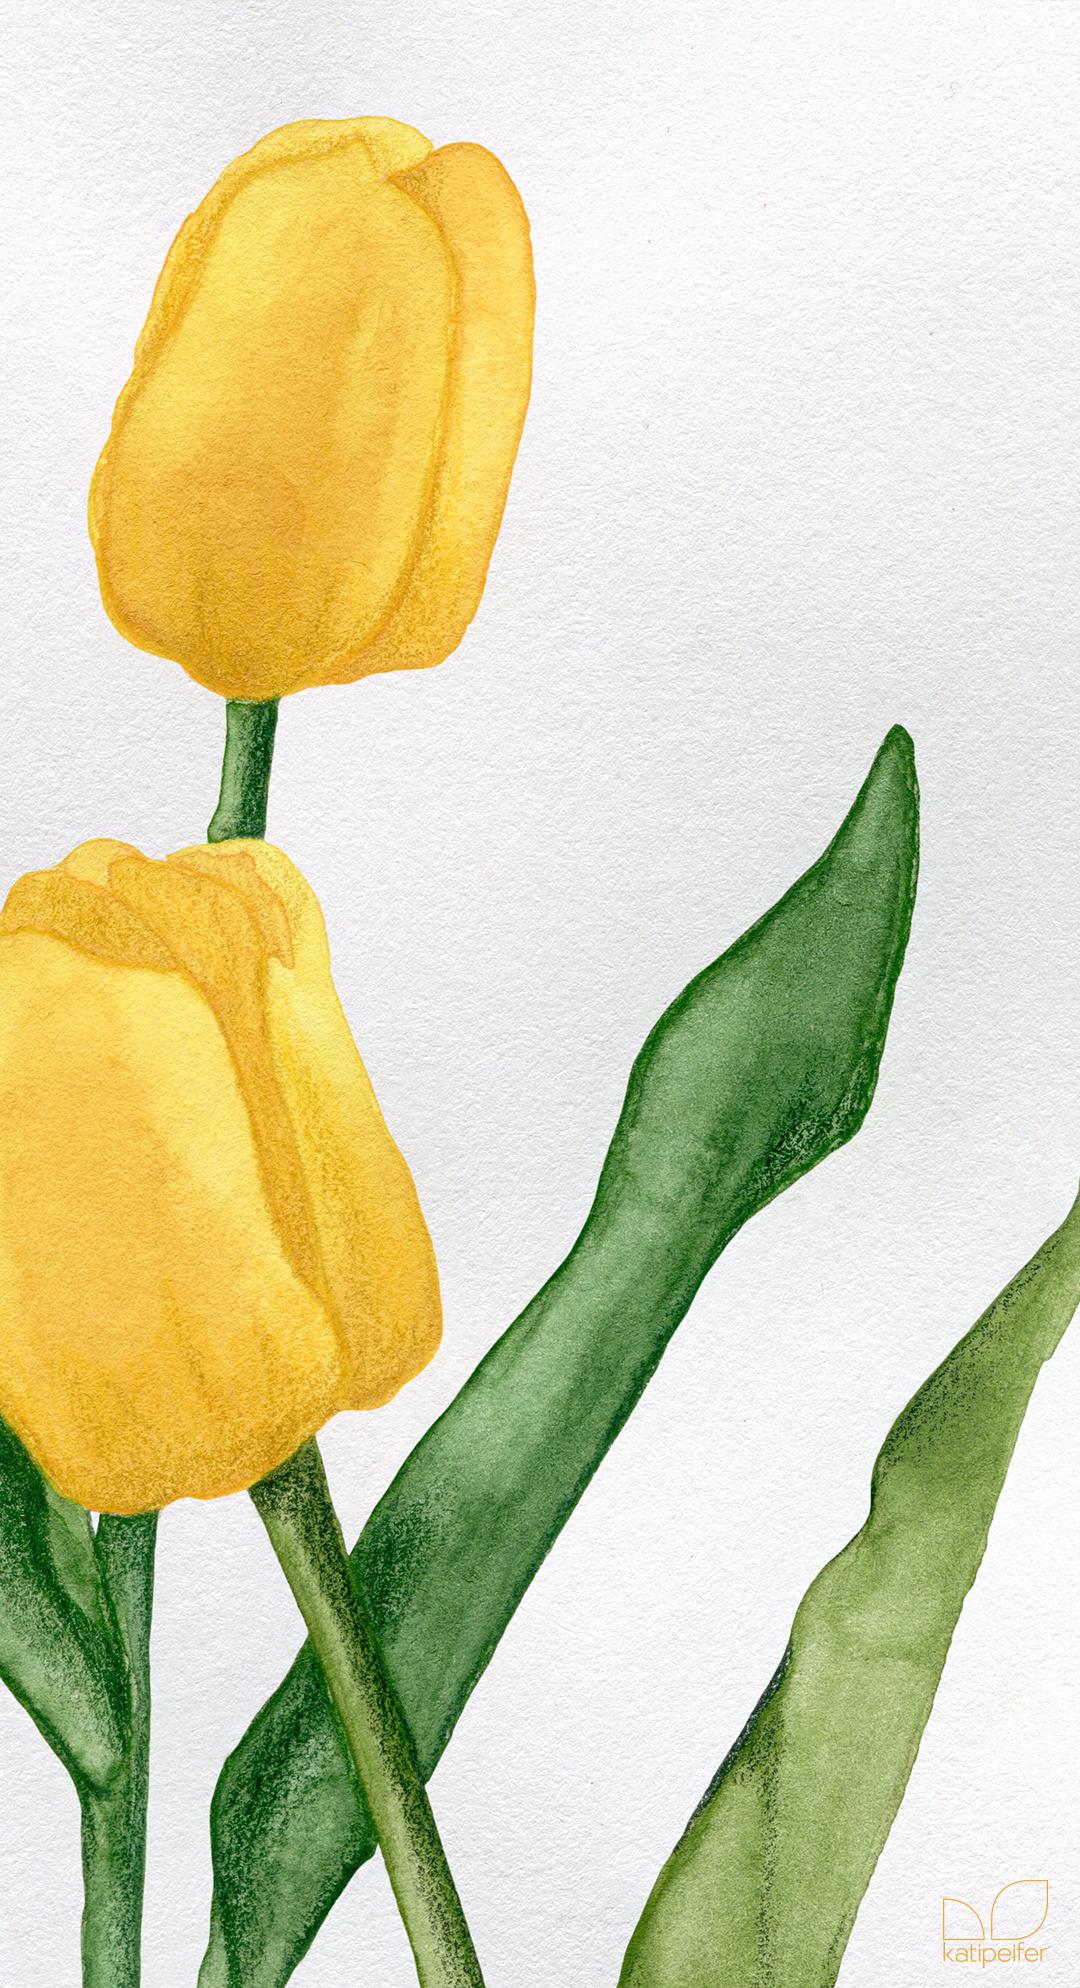 tulips & snowdrops 03 - studio katipeifer